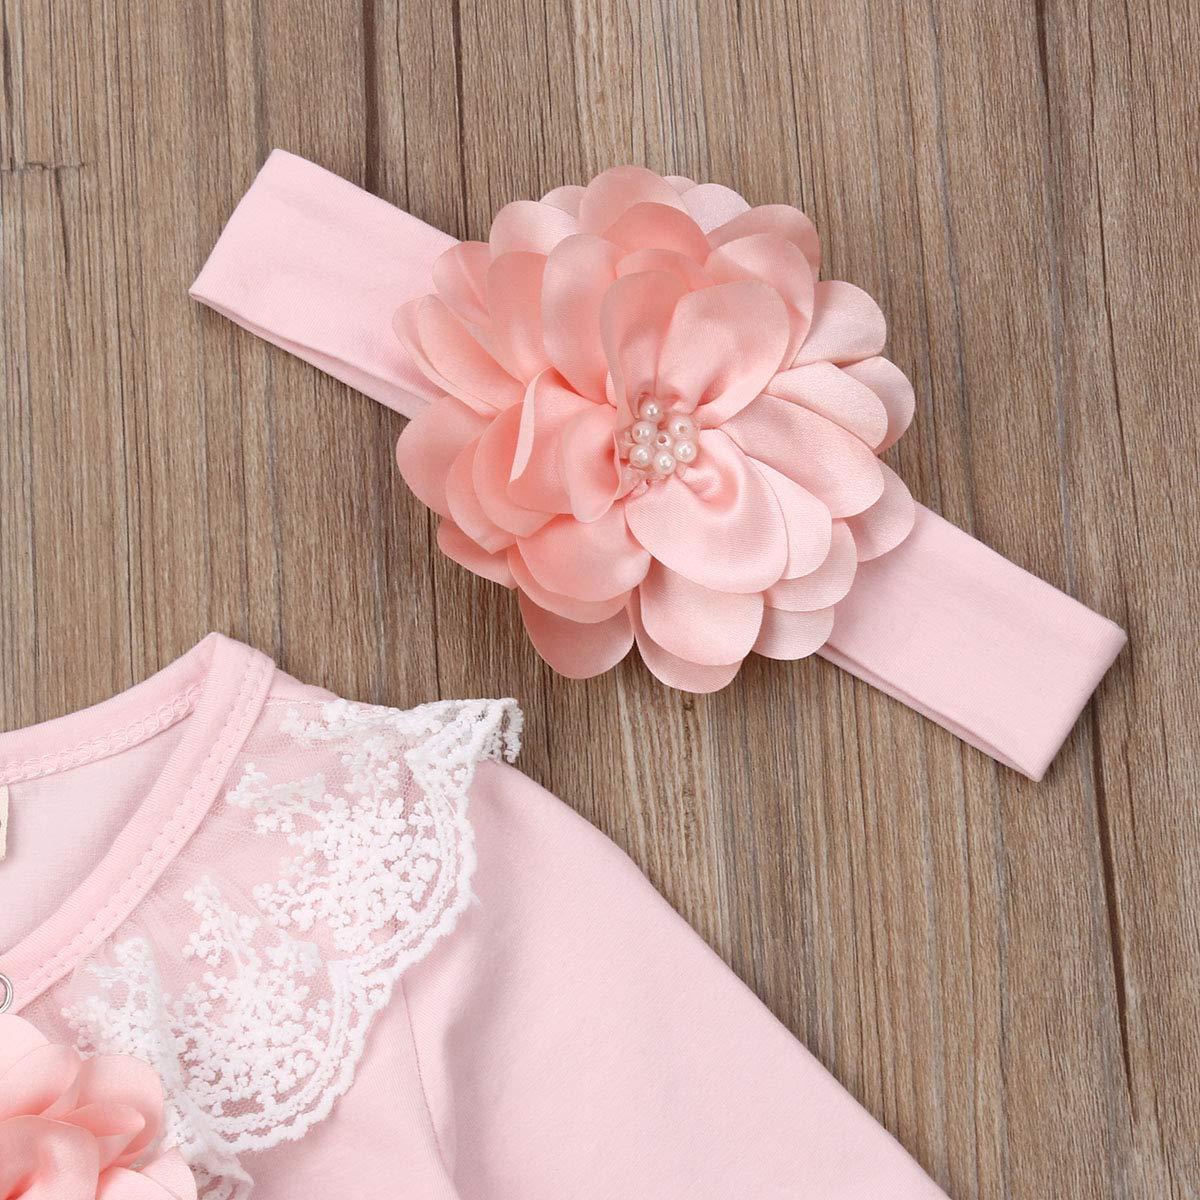 Newborn Baby Girl Long Sleeve Lace Floral Nightgowns Headband Set Sleepwear Sleeping Bag Infant Pajamas